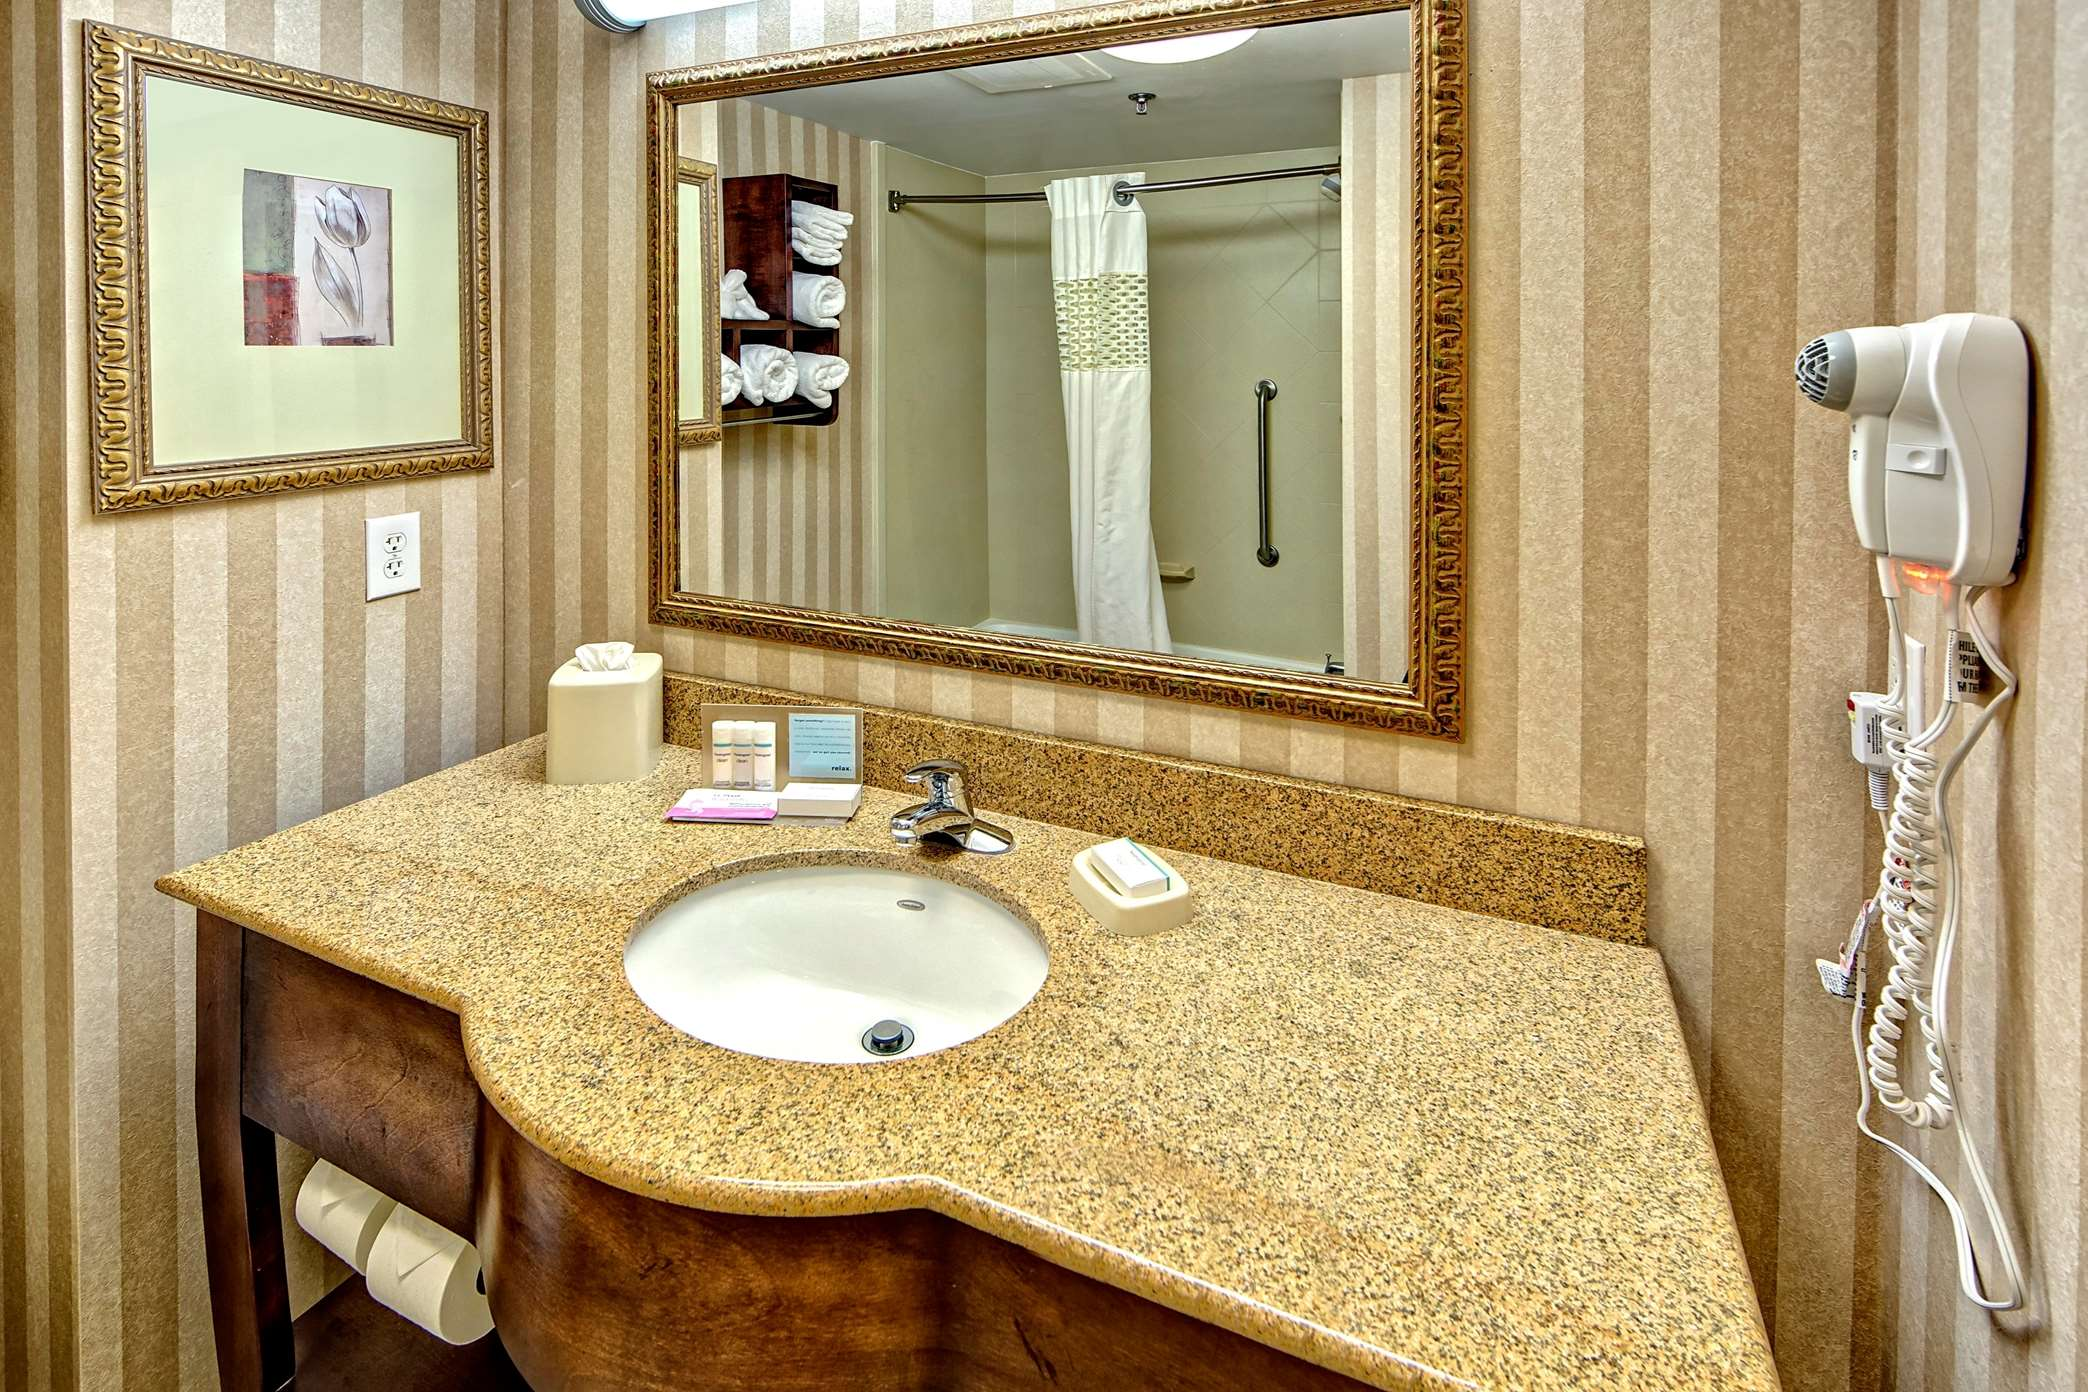 Hampton Inn & Suites Cashiers-Sapphire Valley image 23